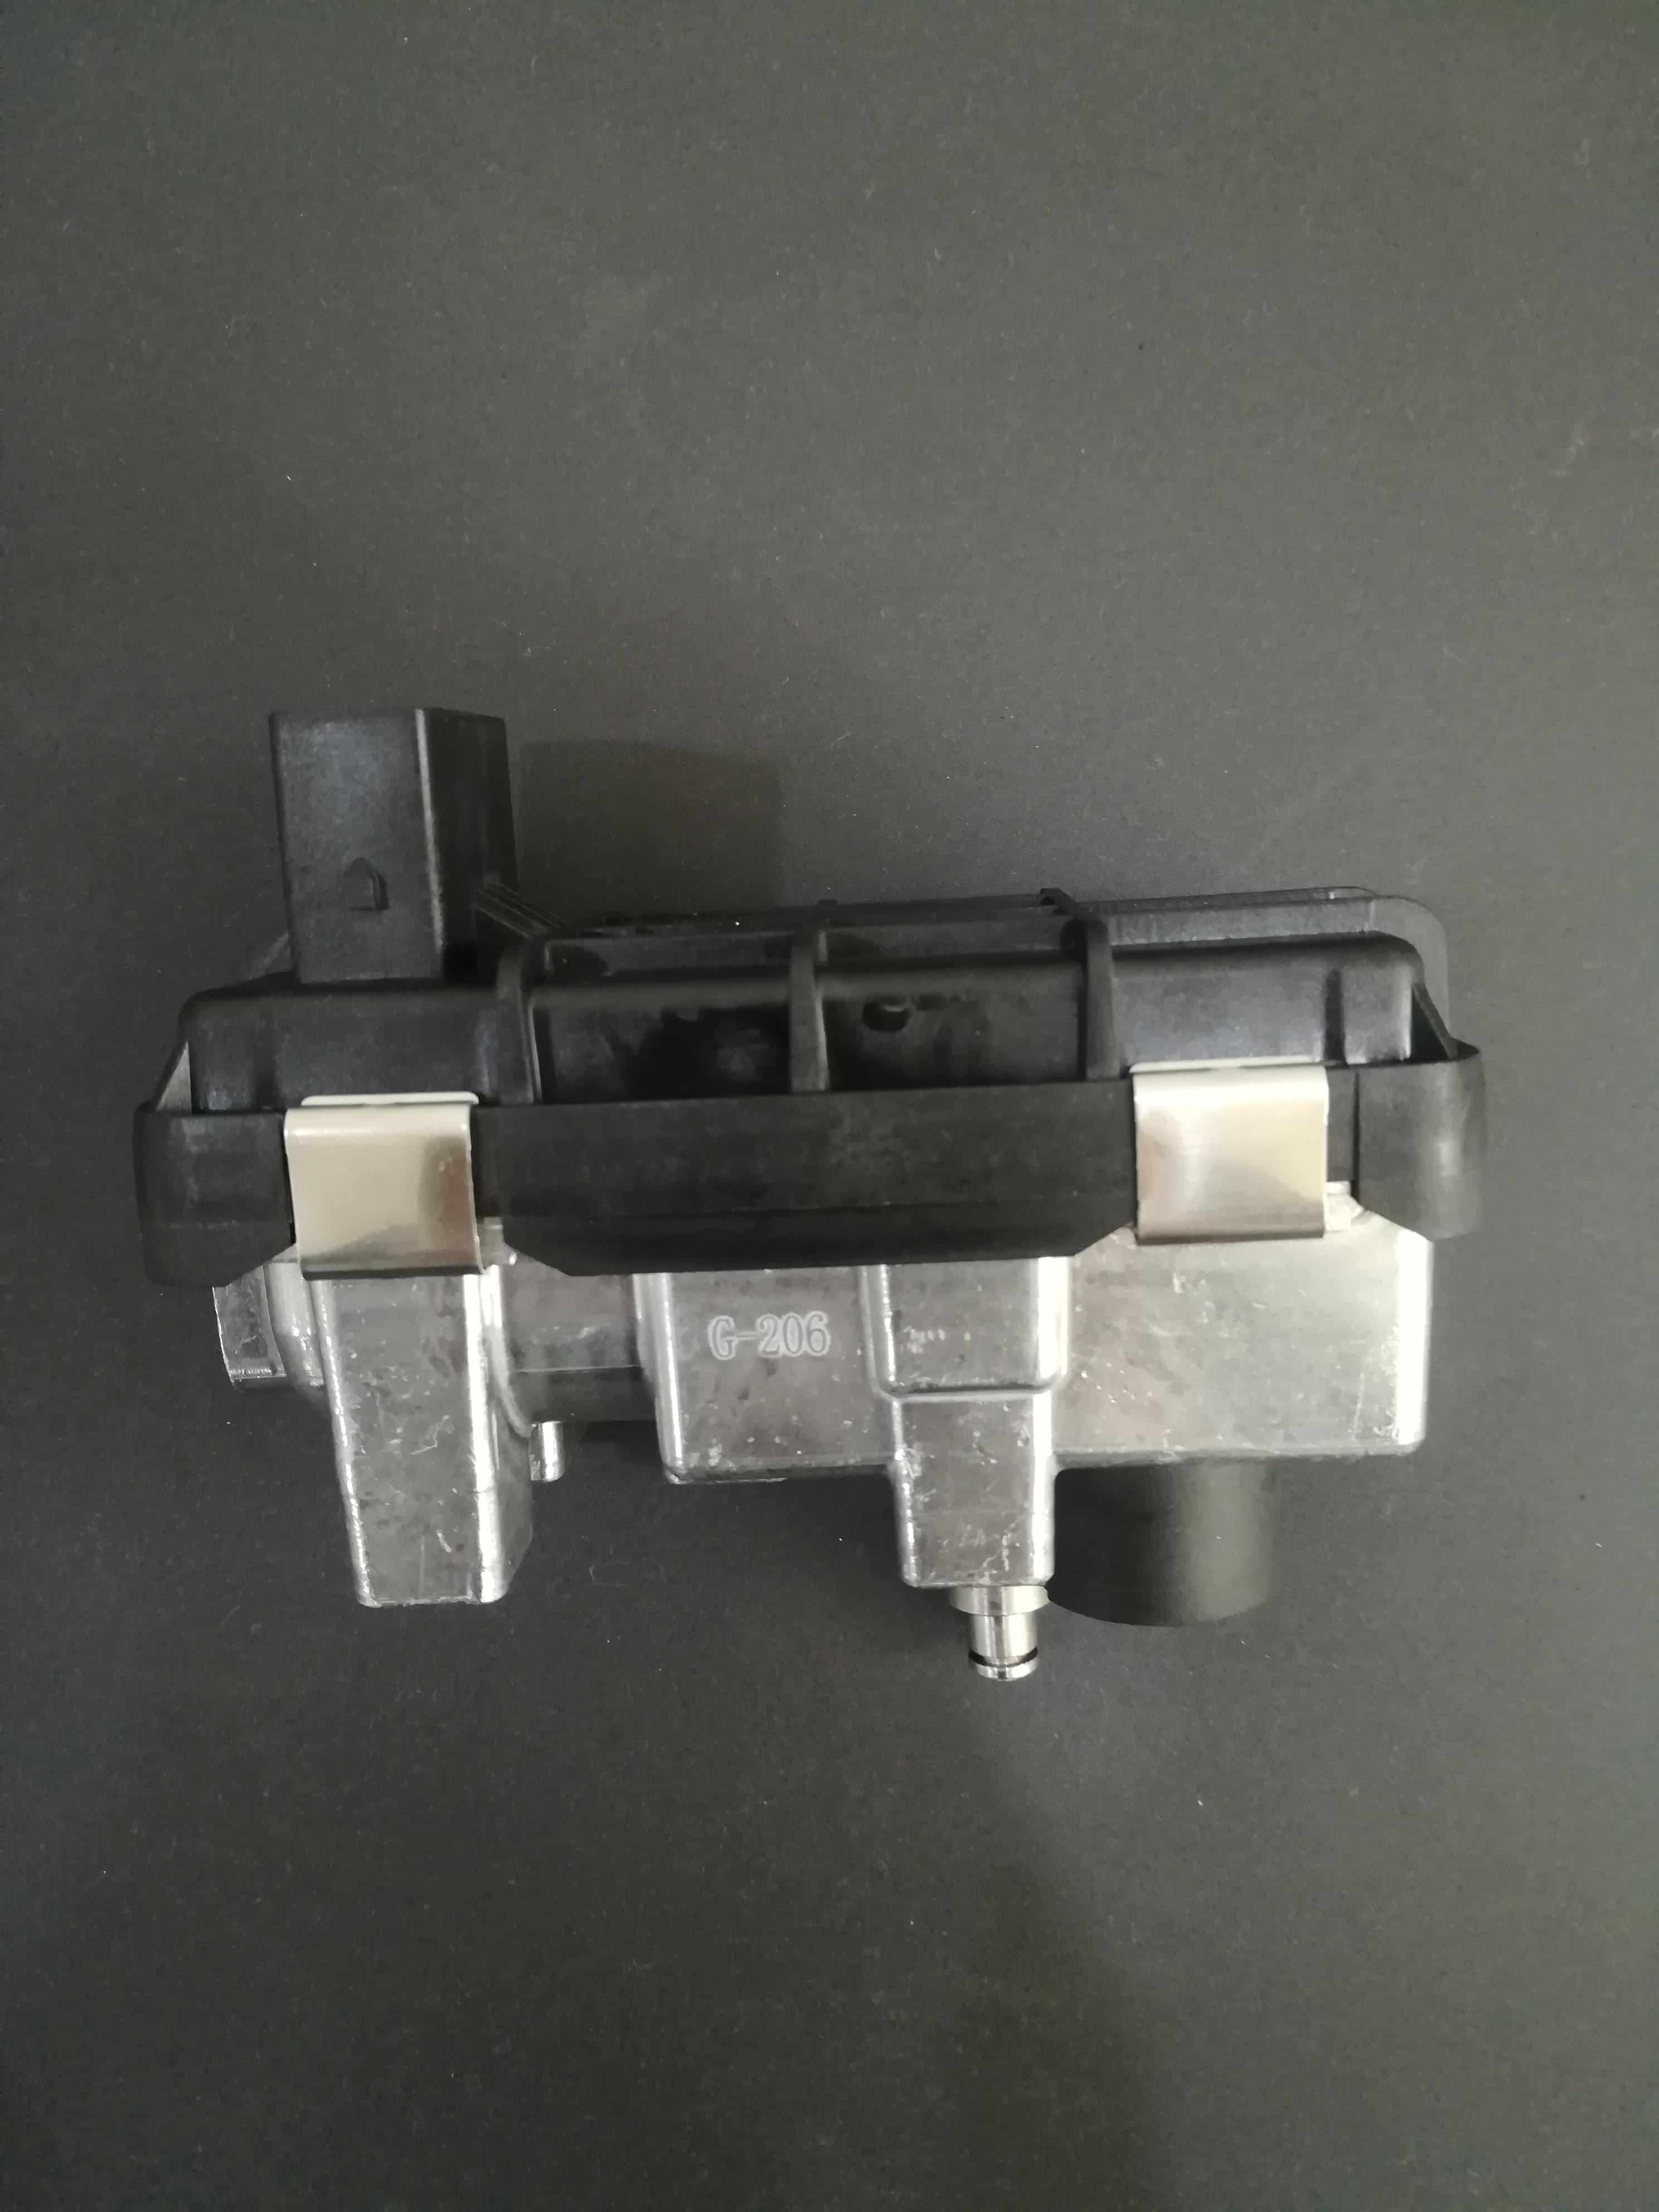 731877-8 731877-9 seolenoid valve 731877-7 actuator turbo electric 320D E46 150HP 729355 wastegate 731877